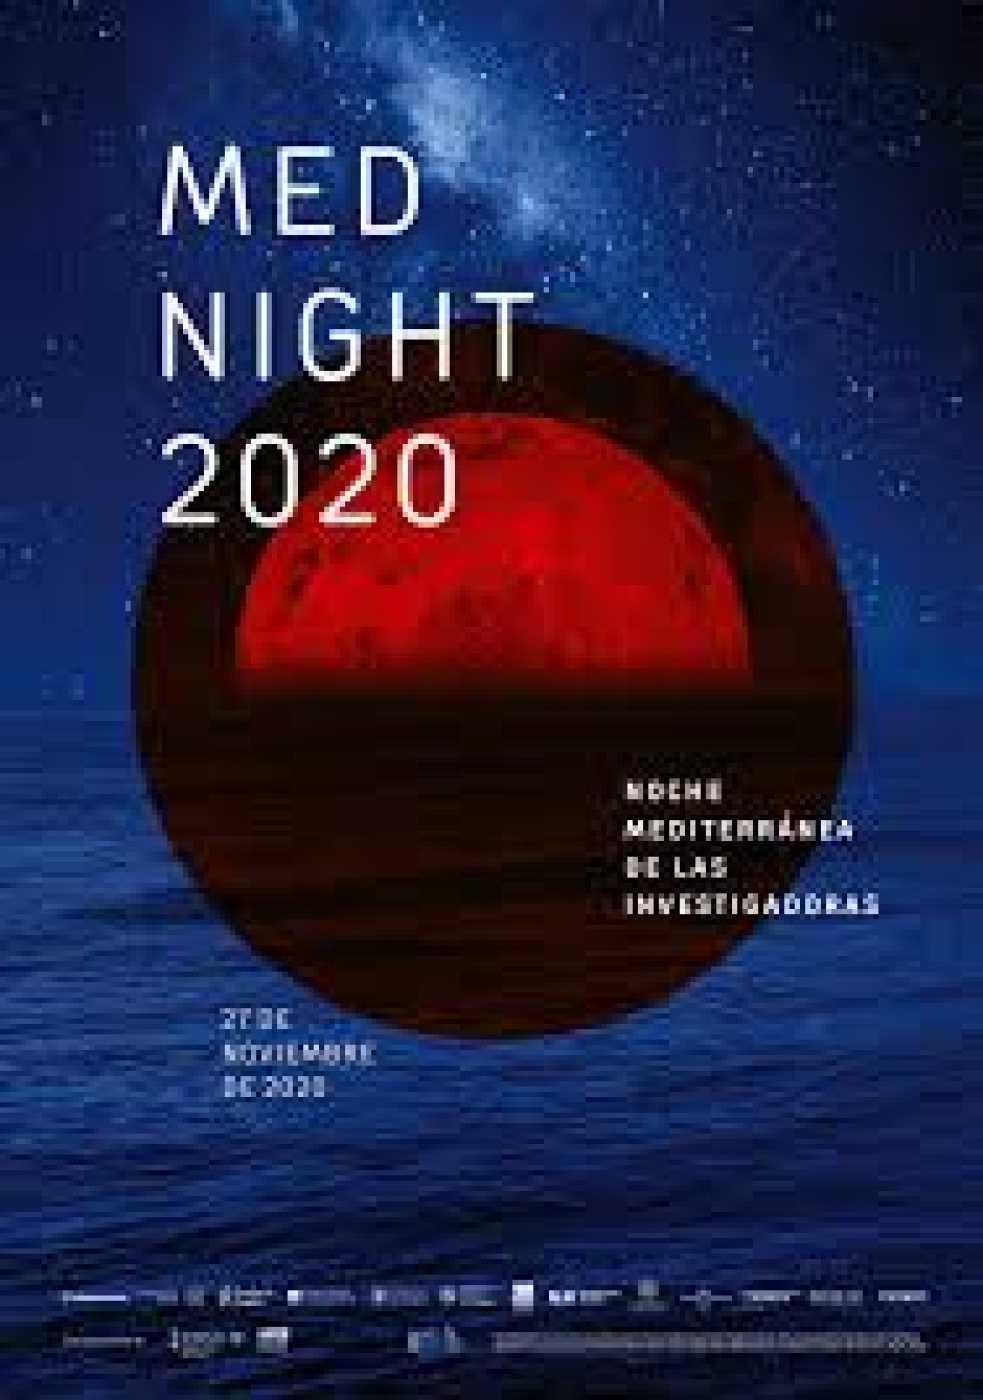 Cronica Noche mediterranea investigadoras - 27/11/20 - Escuchar ahora